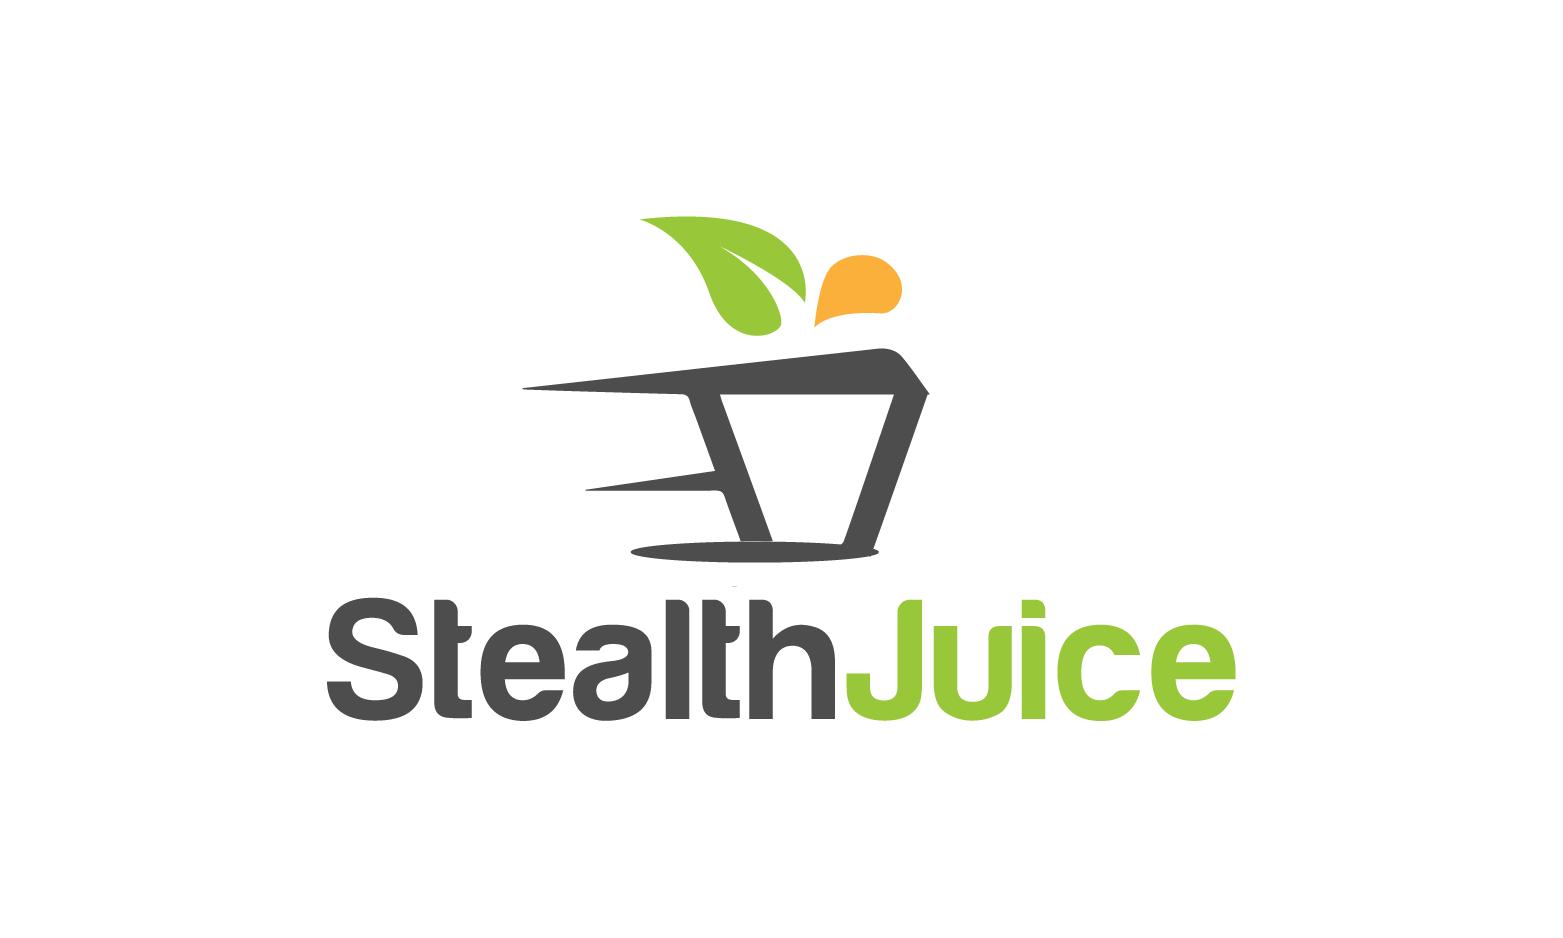 StealthJuice.com